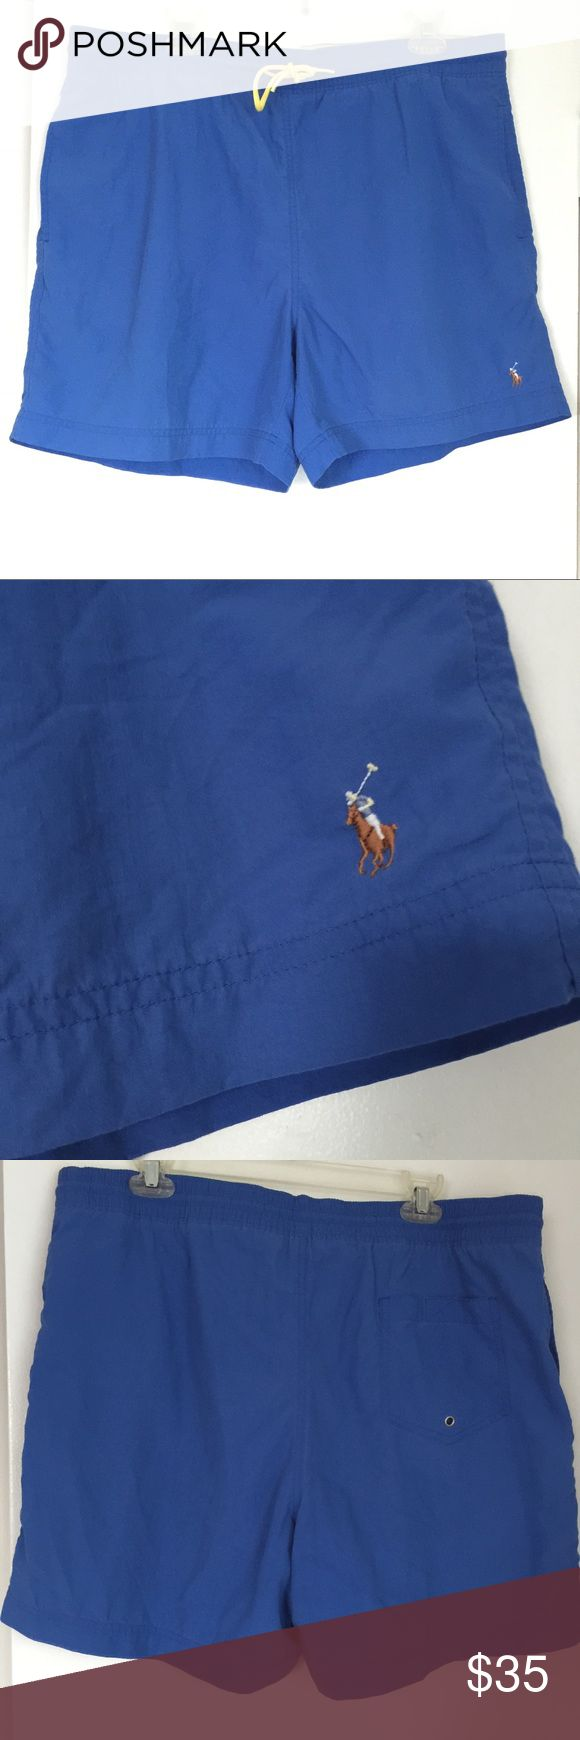 Ralph Lauren Polo Swim Trunks🏊🏄🏼 Men's Ralph Lauren Swim Trunks✖️🏄🏼 Size: L / Color: Blue with yellow details / Tie waist / Back Pocket / NWT In Mint Condition! / tags: swim suit, polo, sport Ralph Lauren Swim